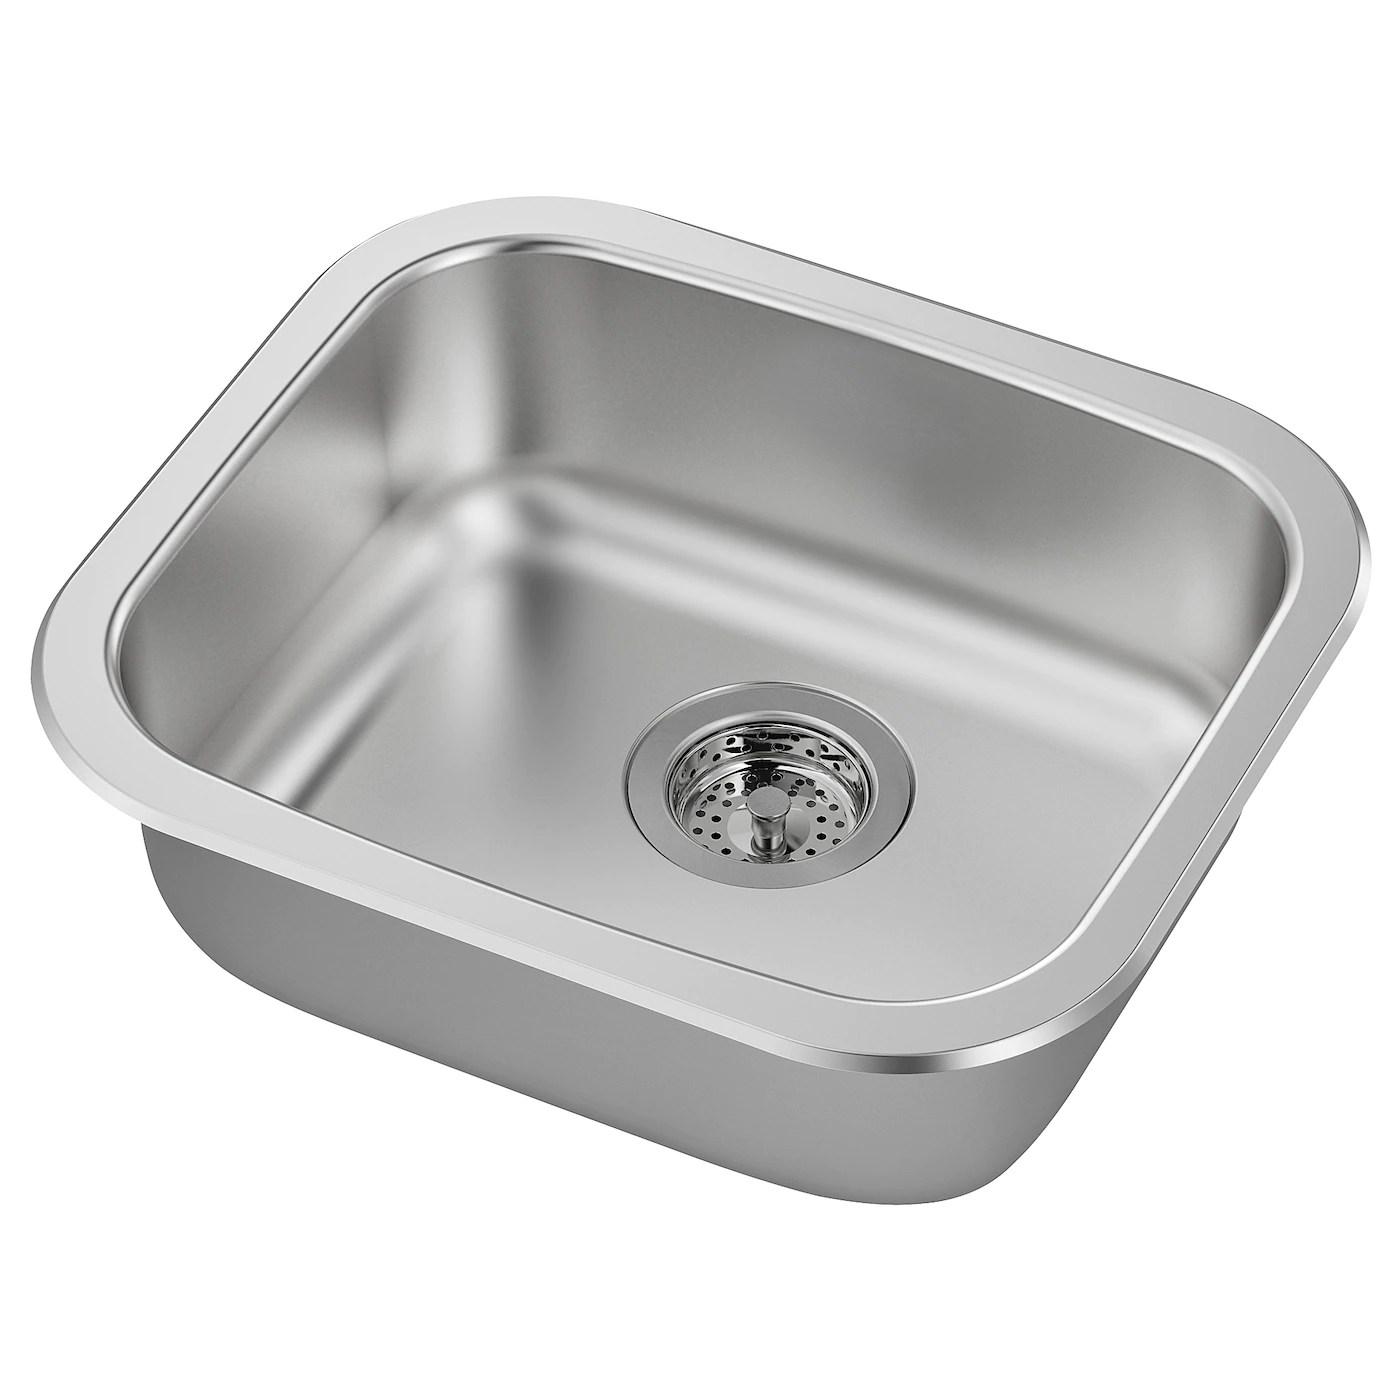 kitchen sinks stainless steel double